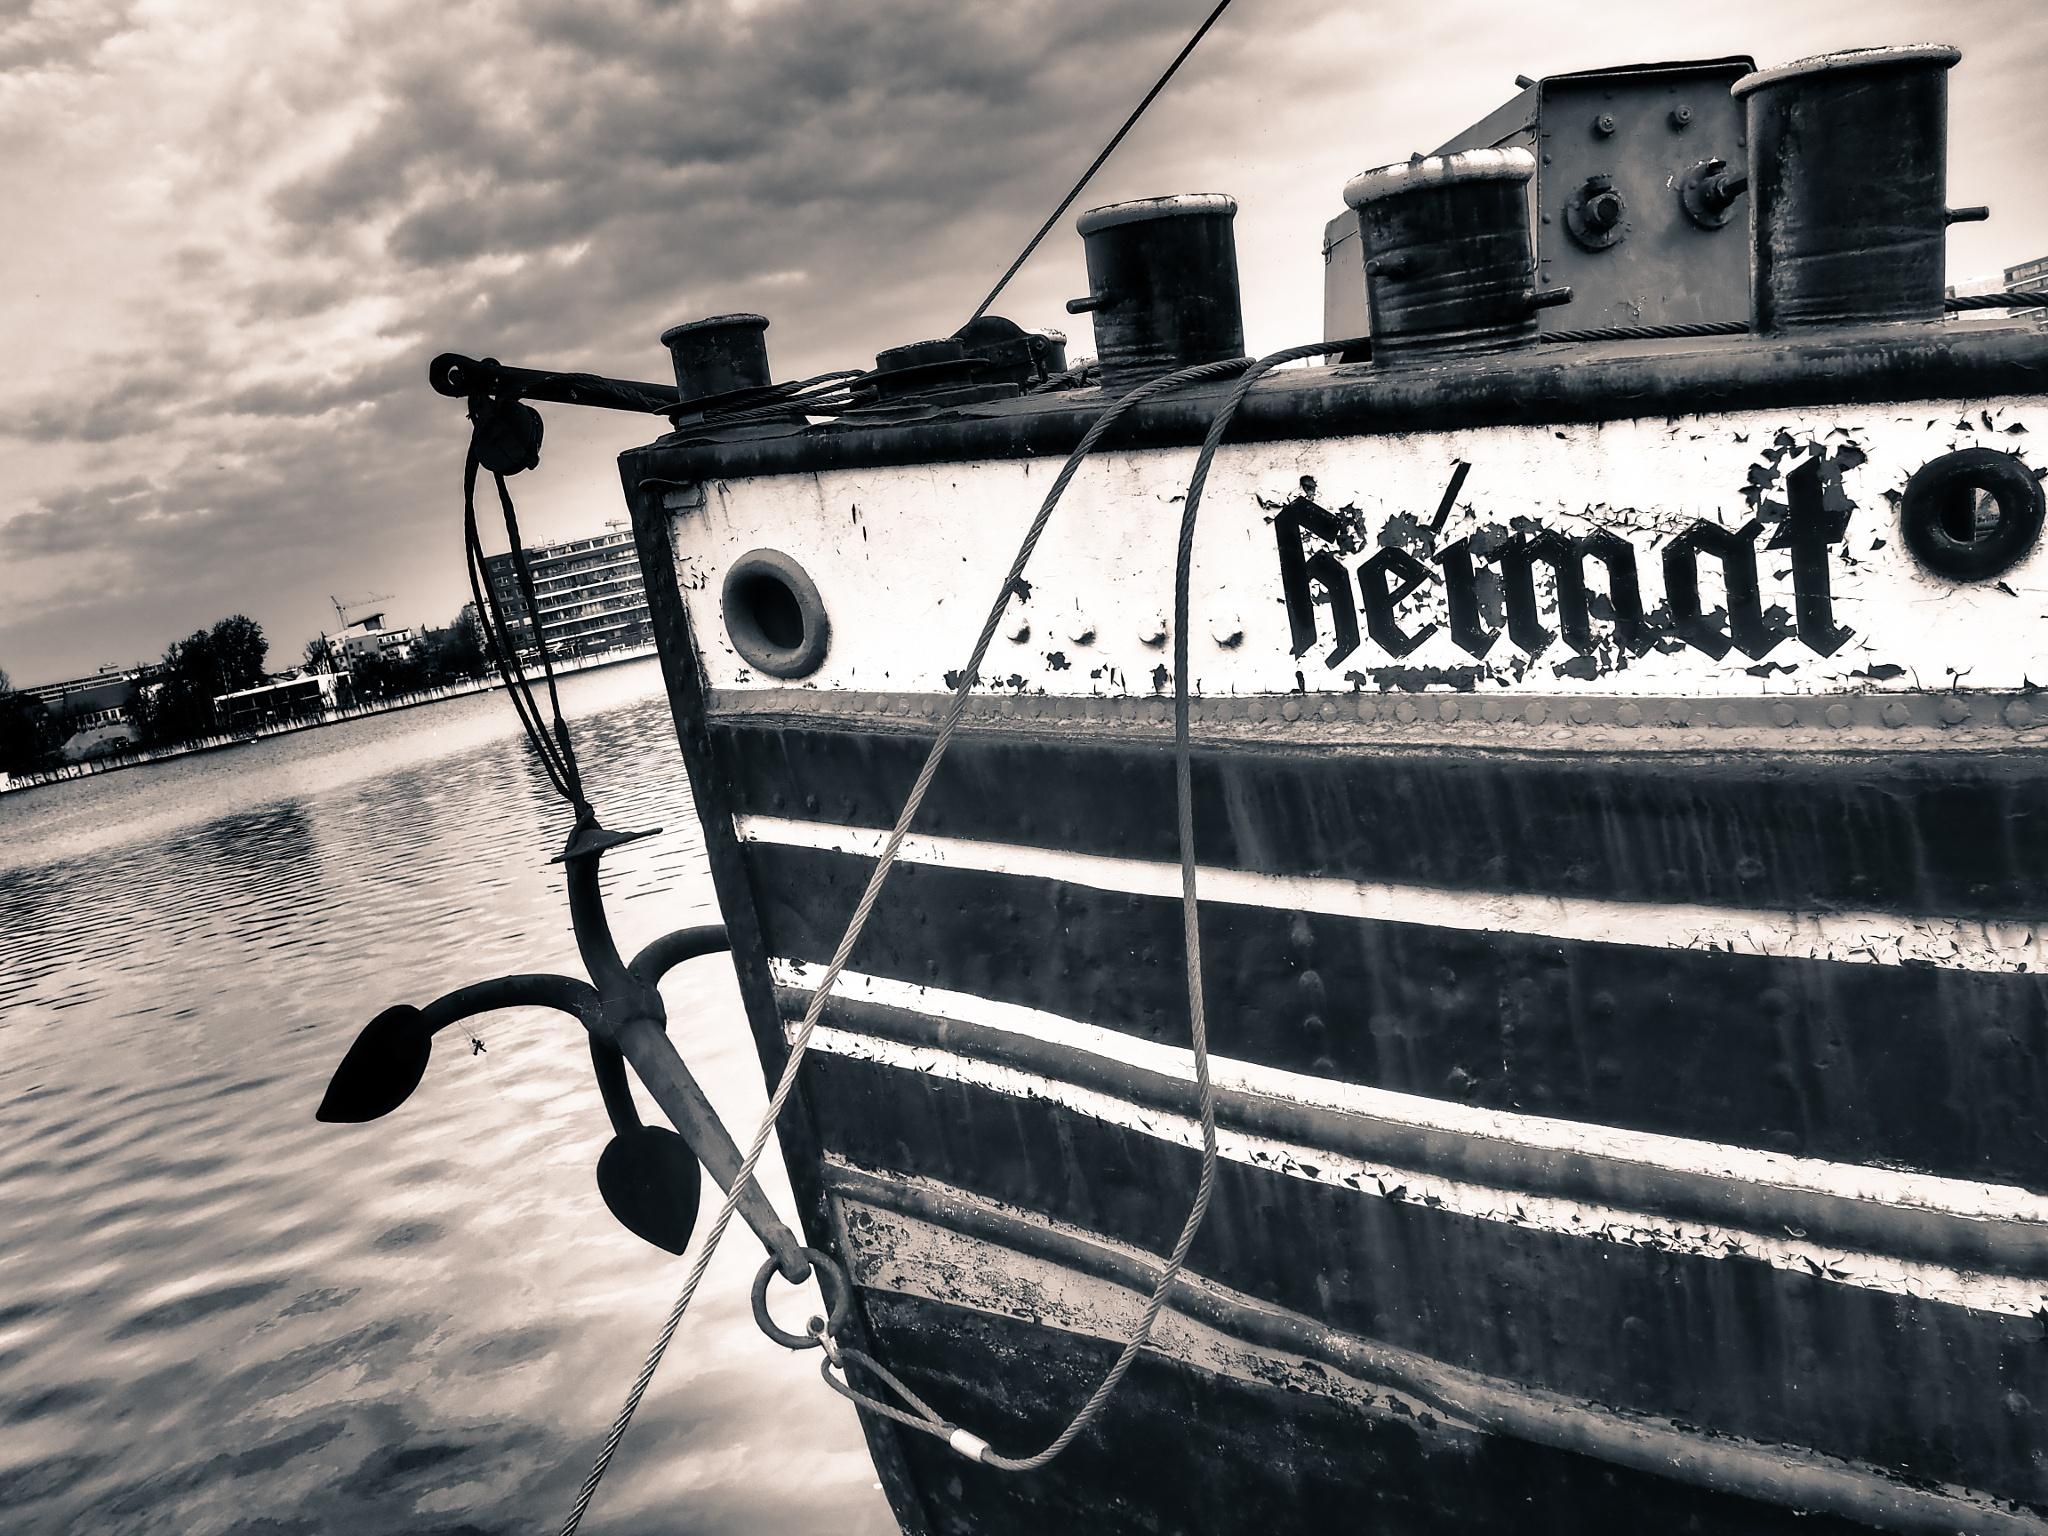 Berlin Ship Black & White by Jeans Brown Photography / Jens Schwarz